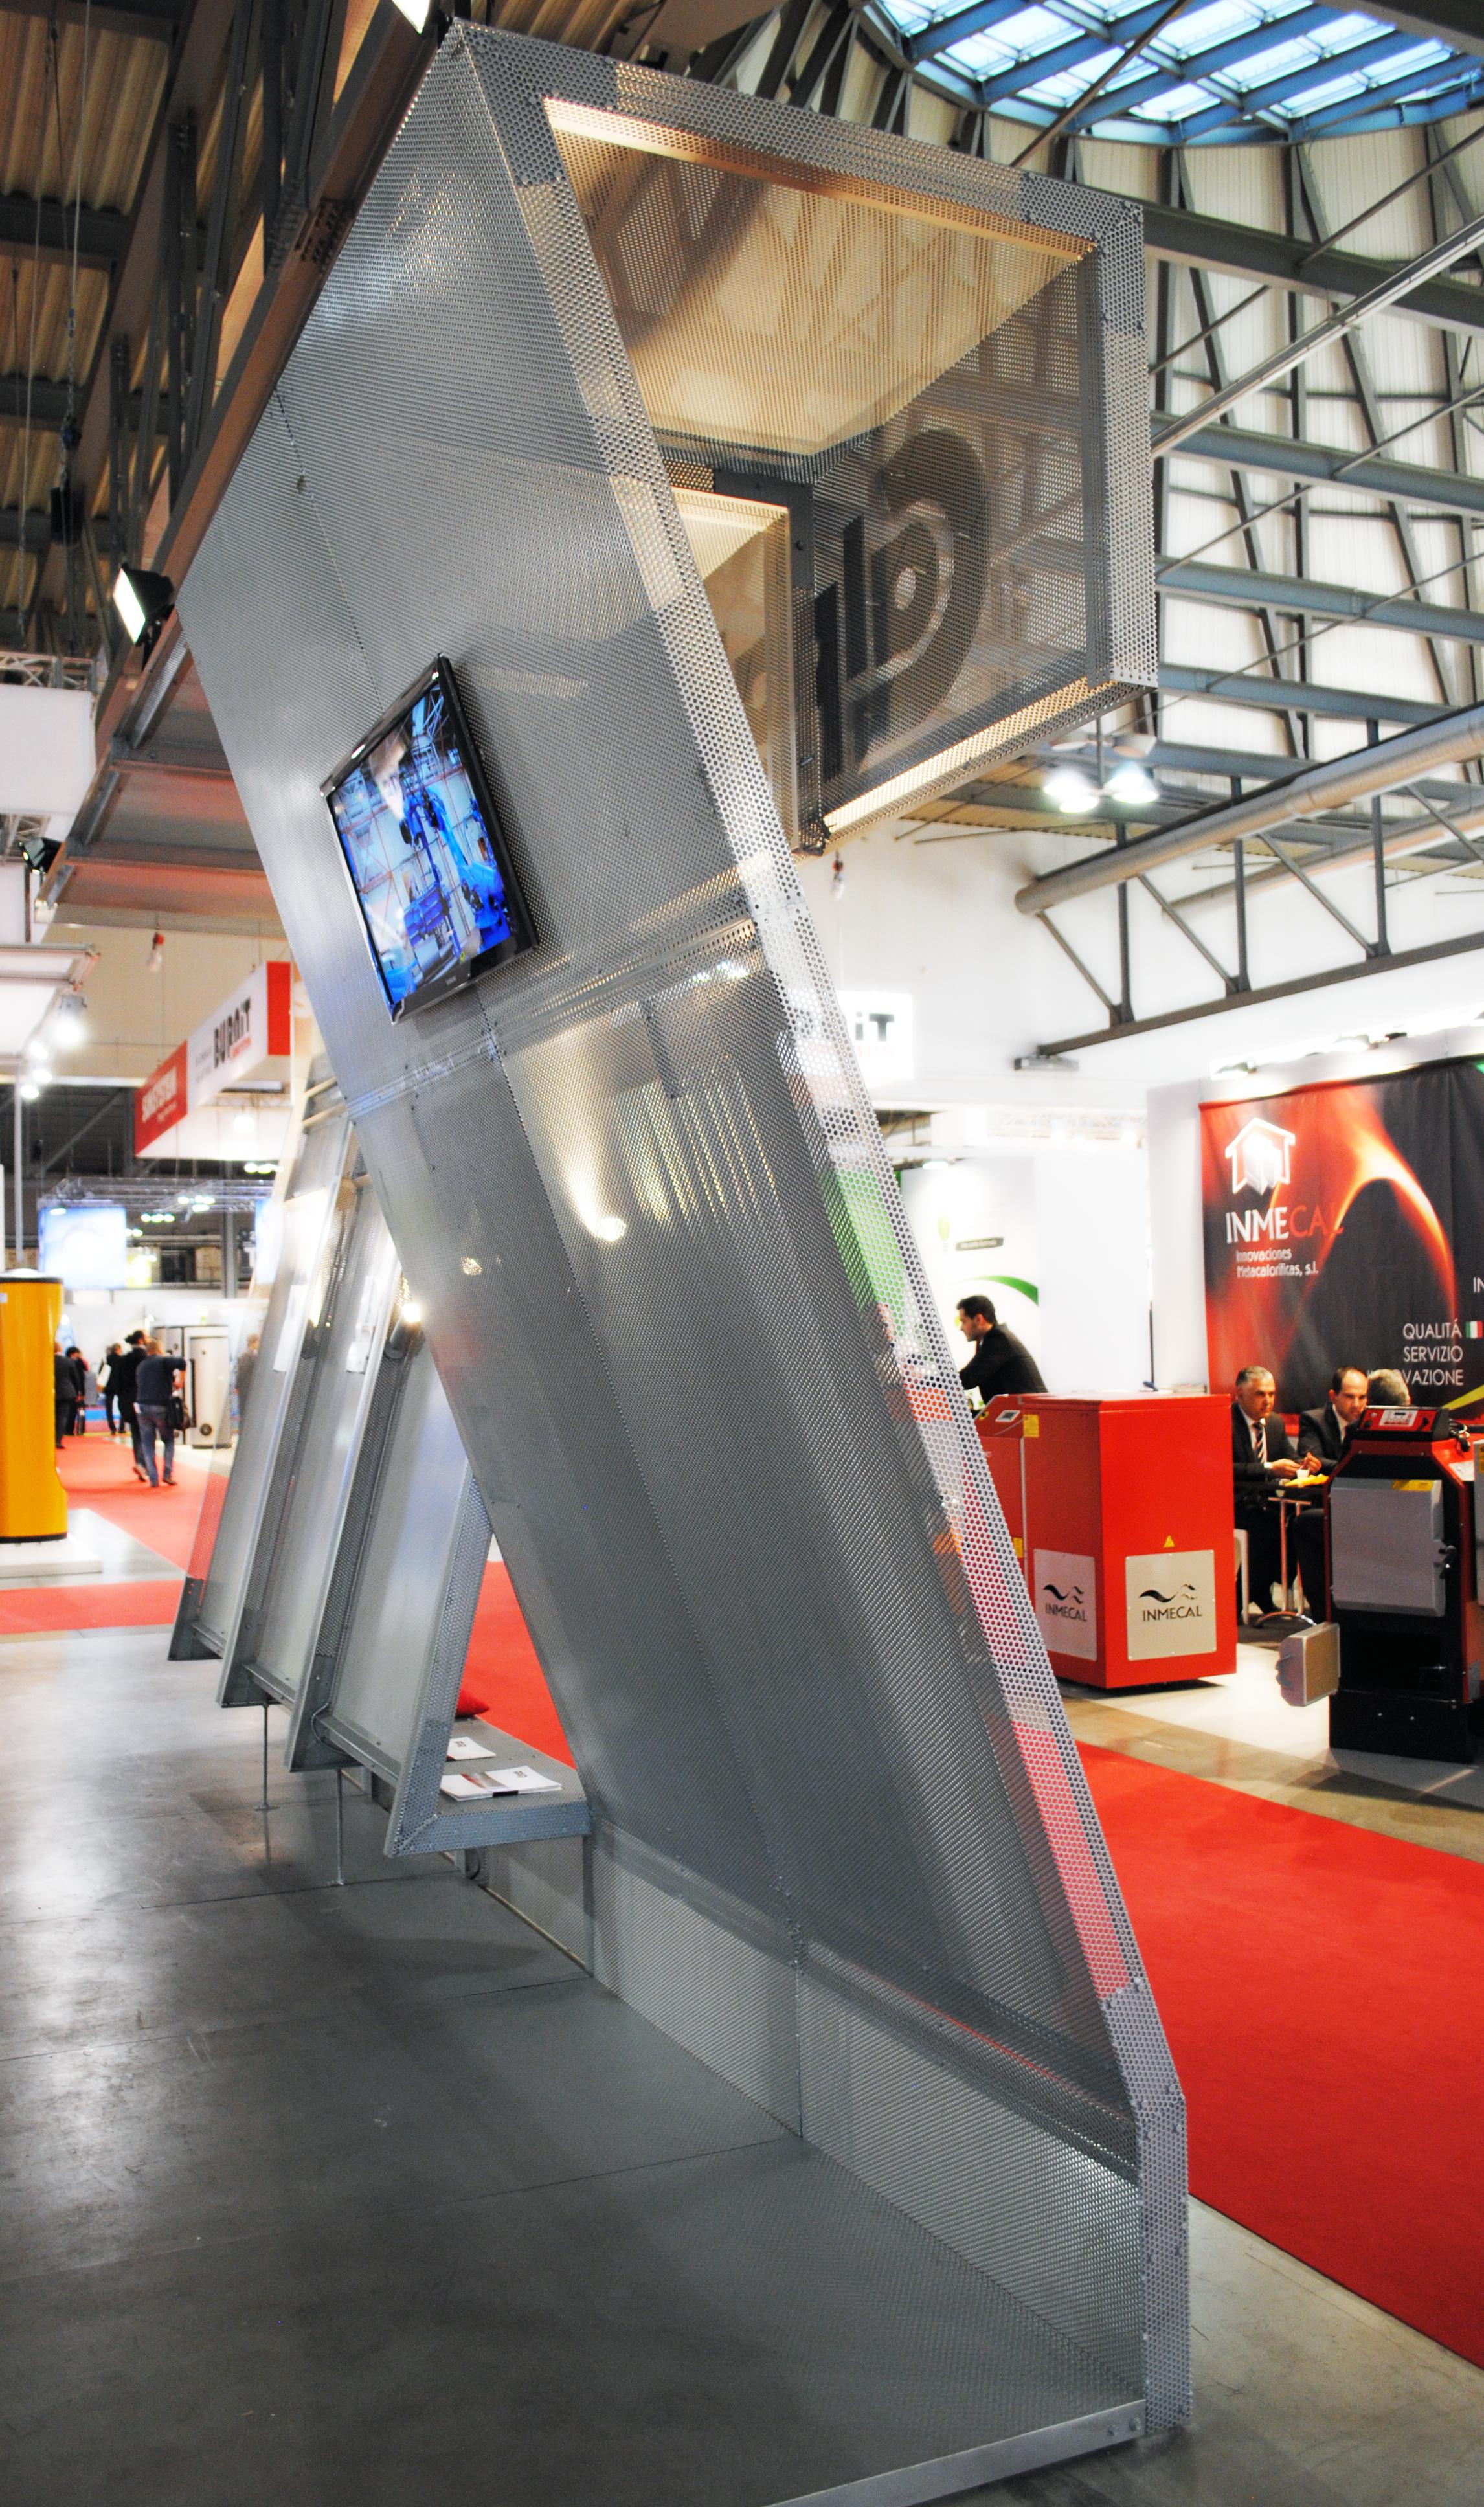 Exhibition Pavilion in Milan